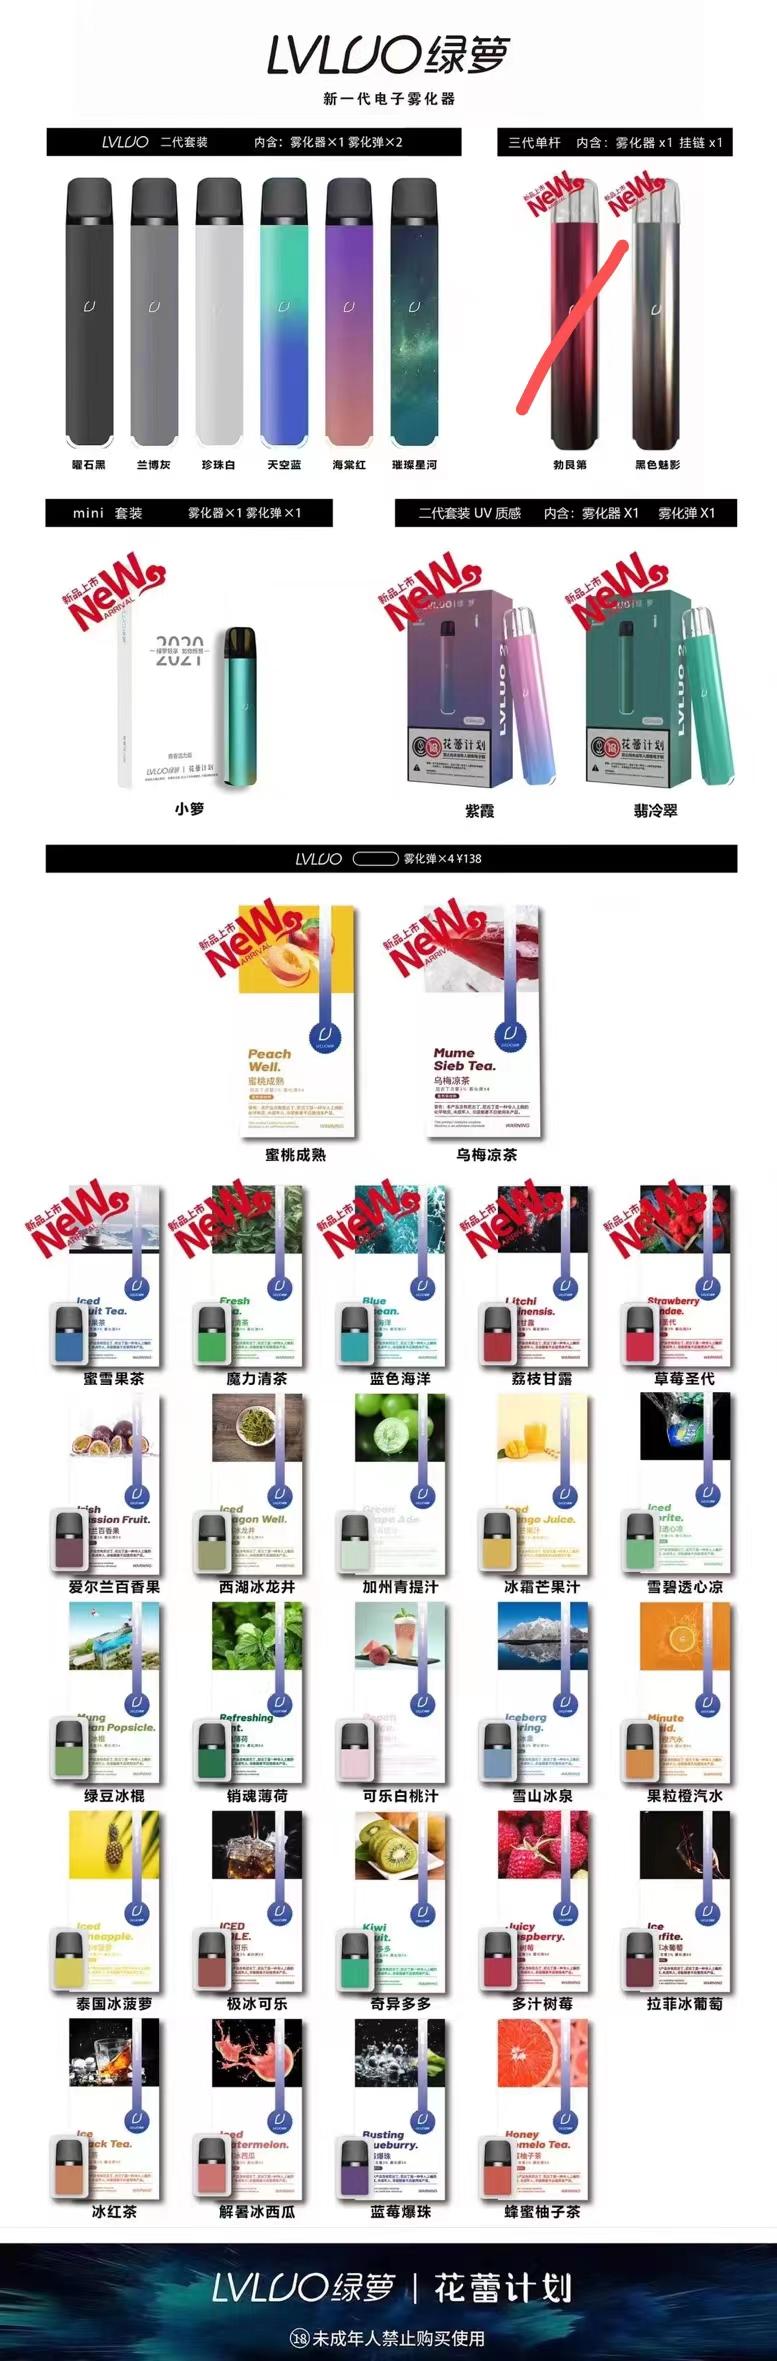 【LVLUO】绿萝二代电子烟代理价格表有吗,好做吗,继行蒸